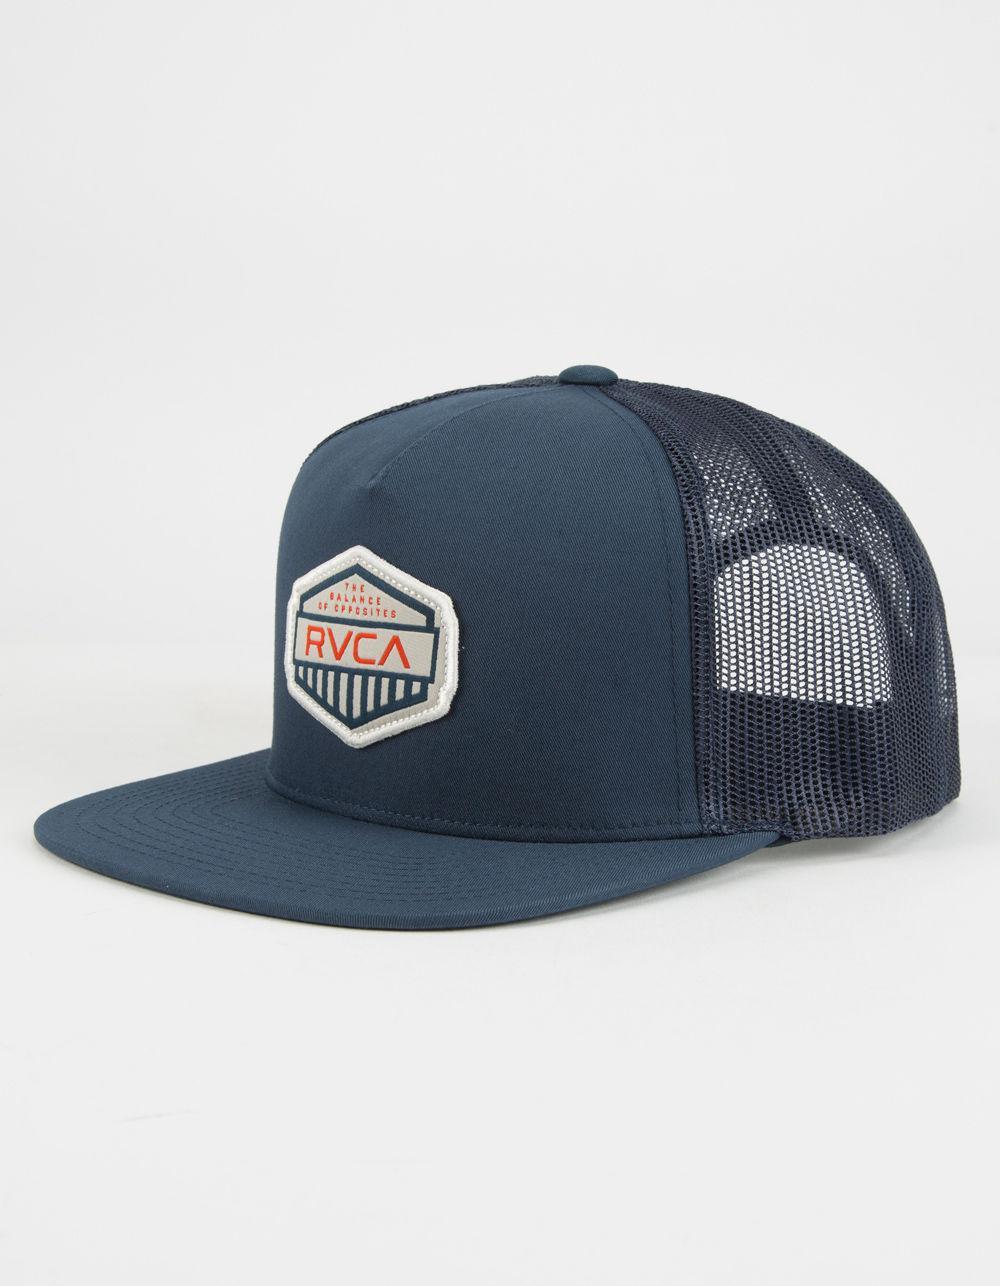 944c3d8af8e4a ... order lyst rvca cargo mens trucker hat in blue for men 94bc2 711cd